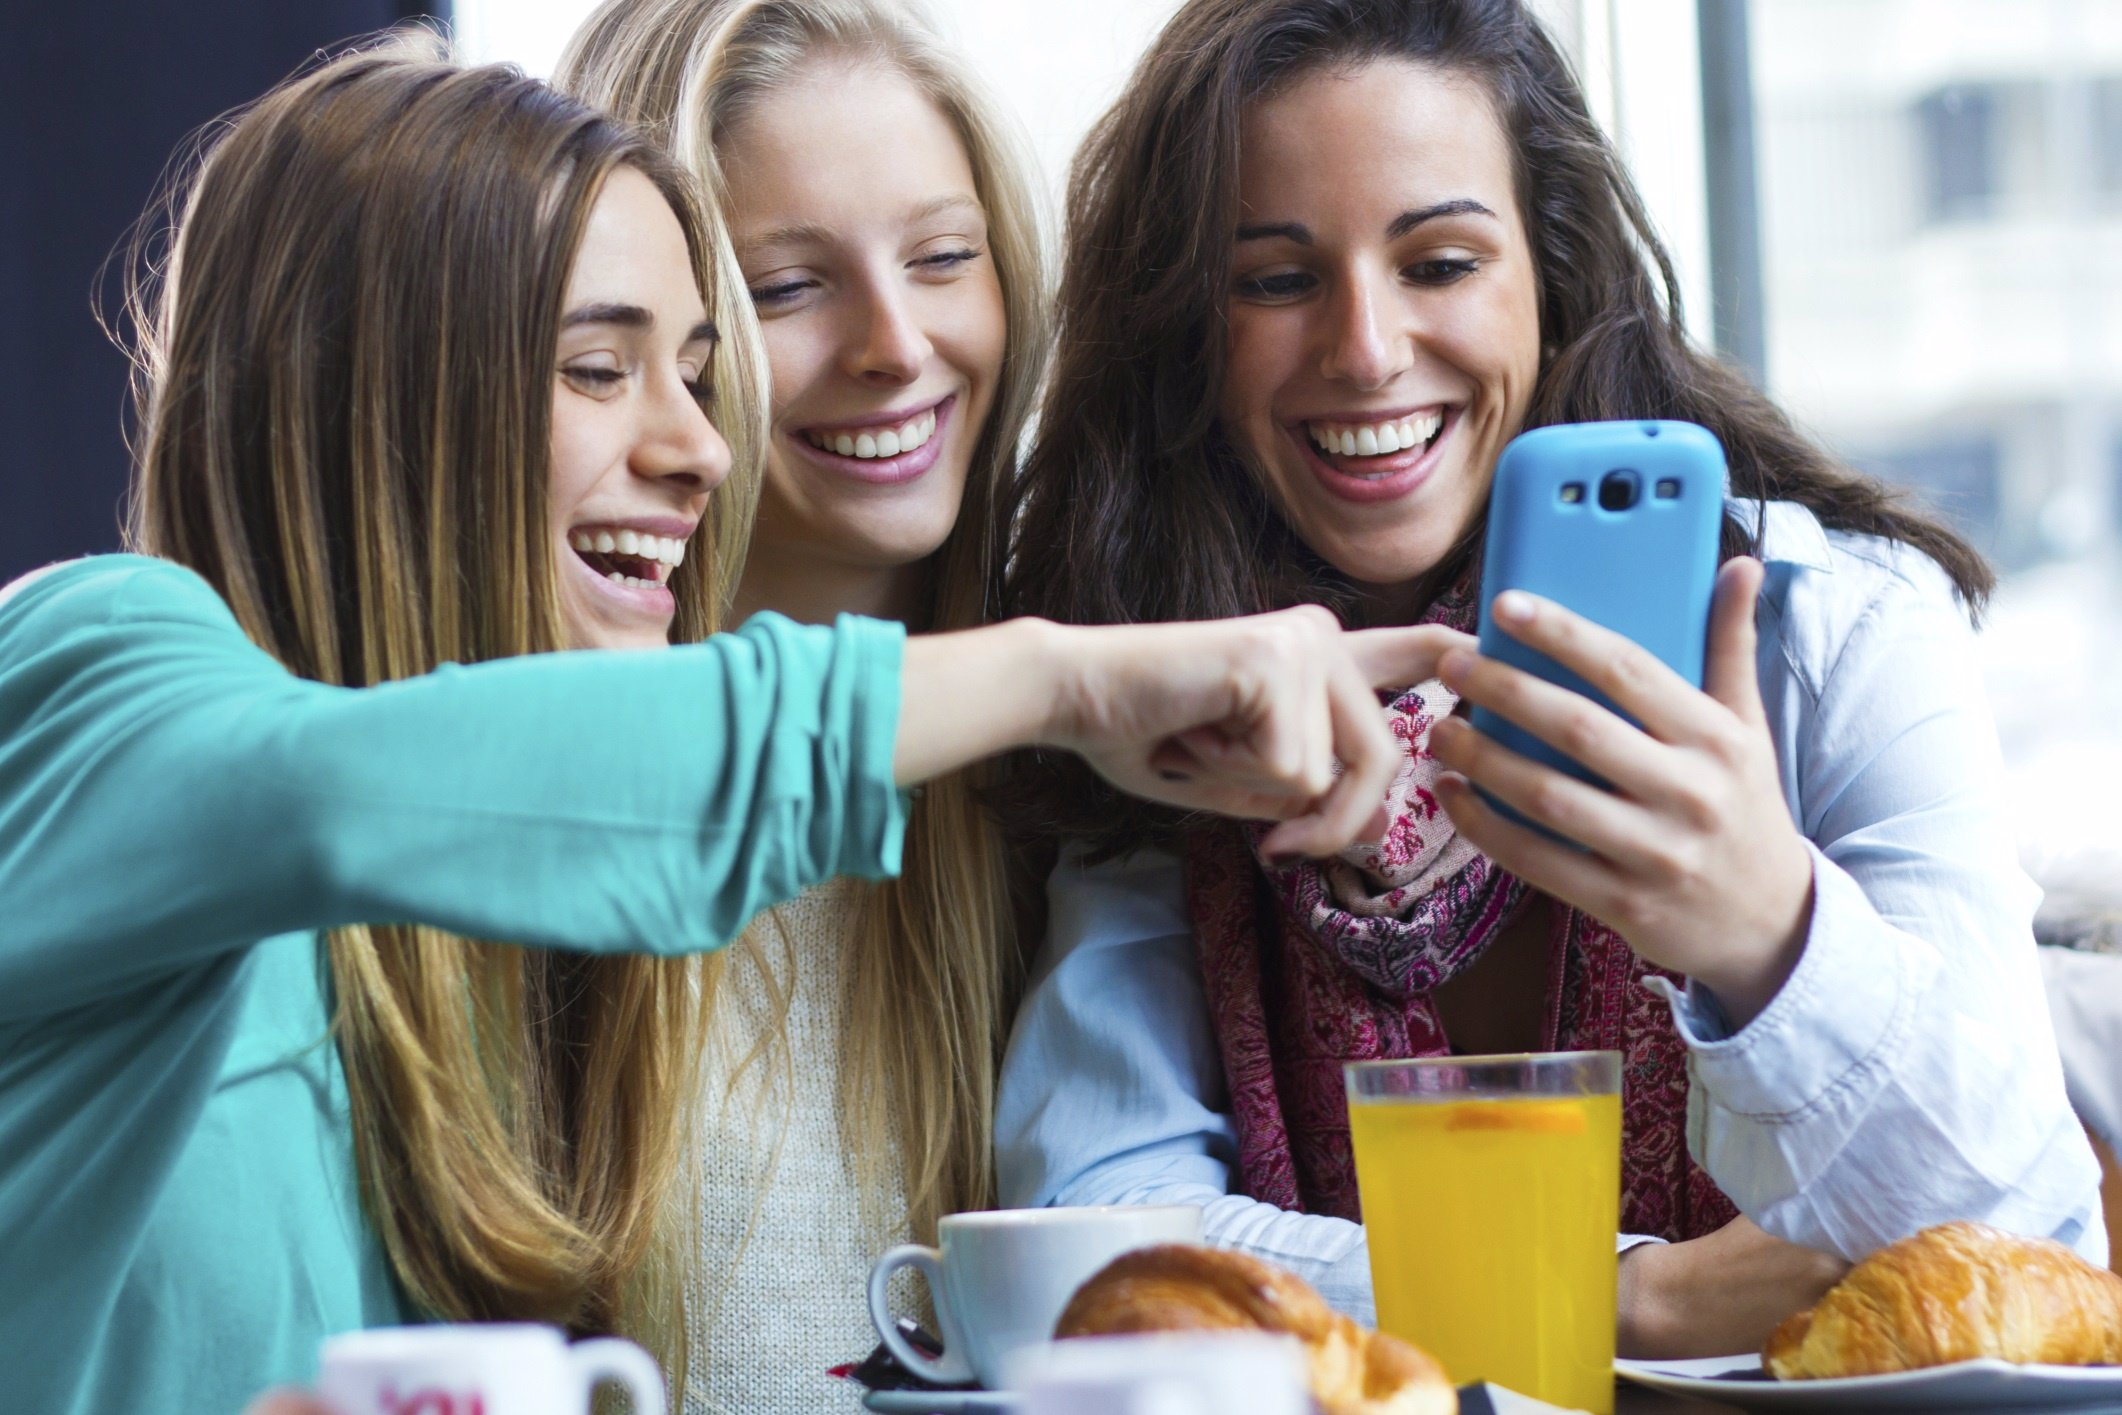 La importancia de proteger tu smartphone